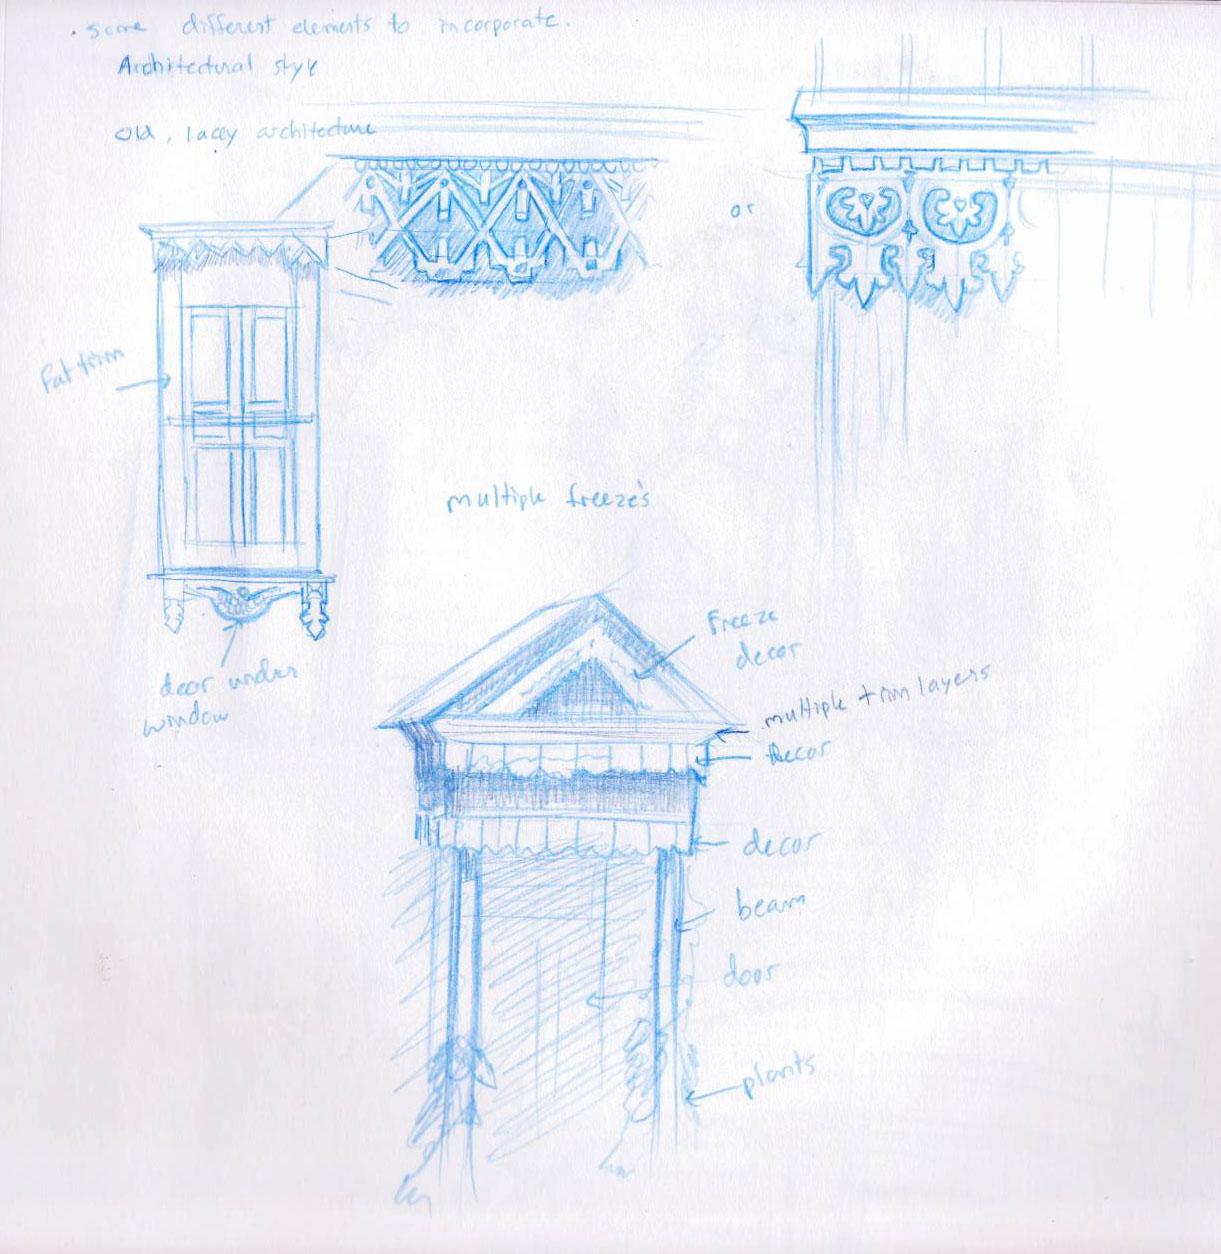 Architecture Study 1